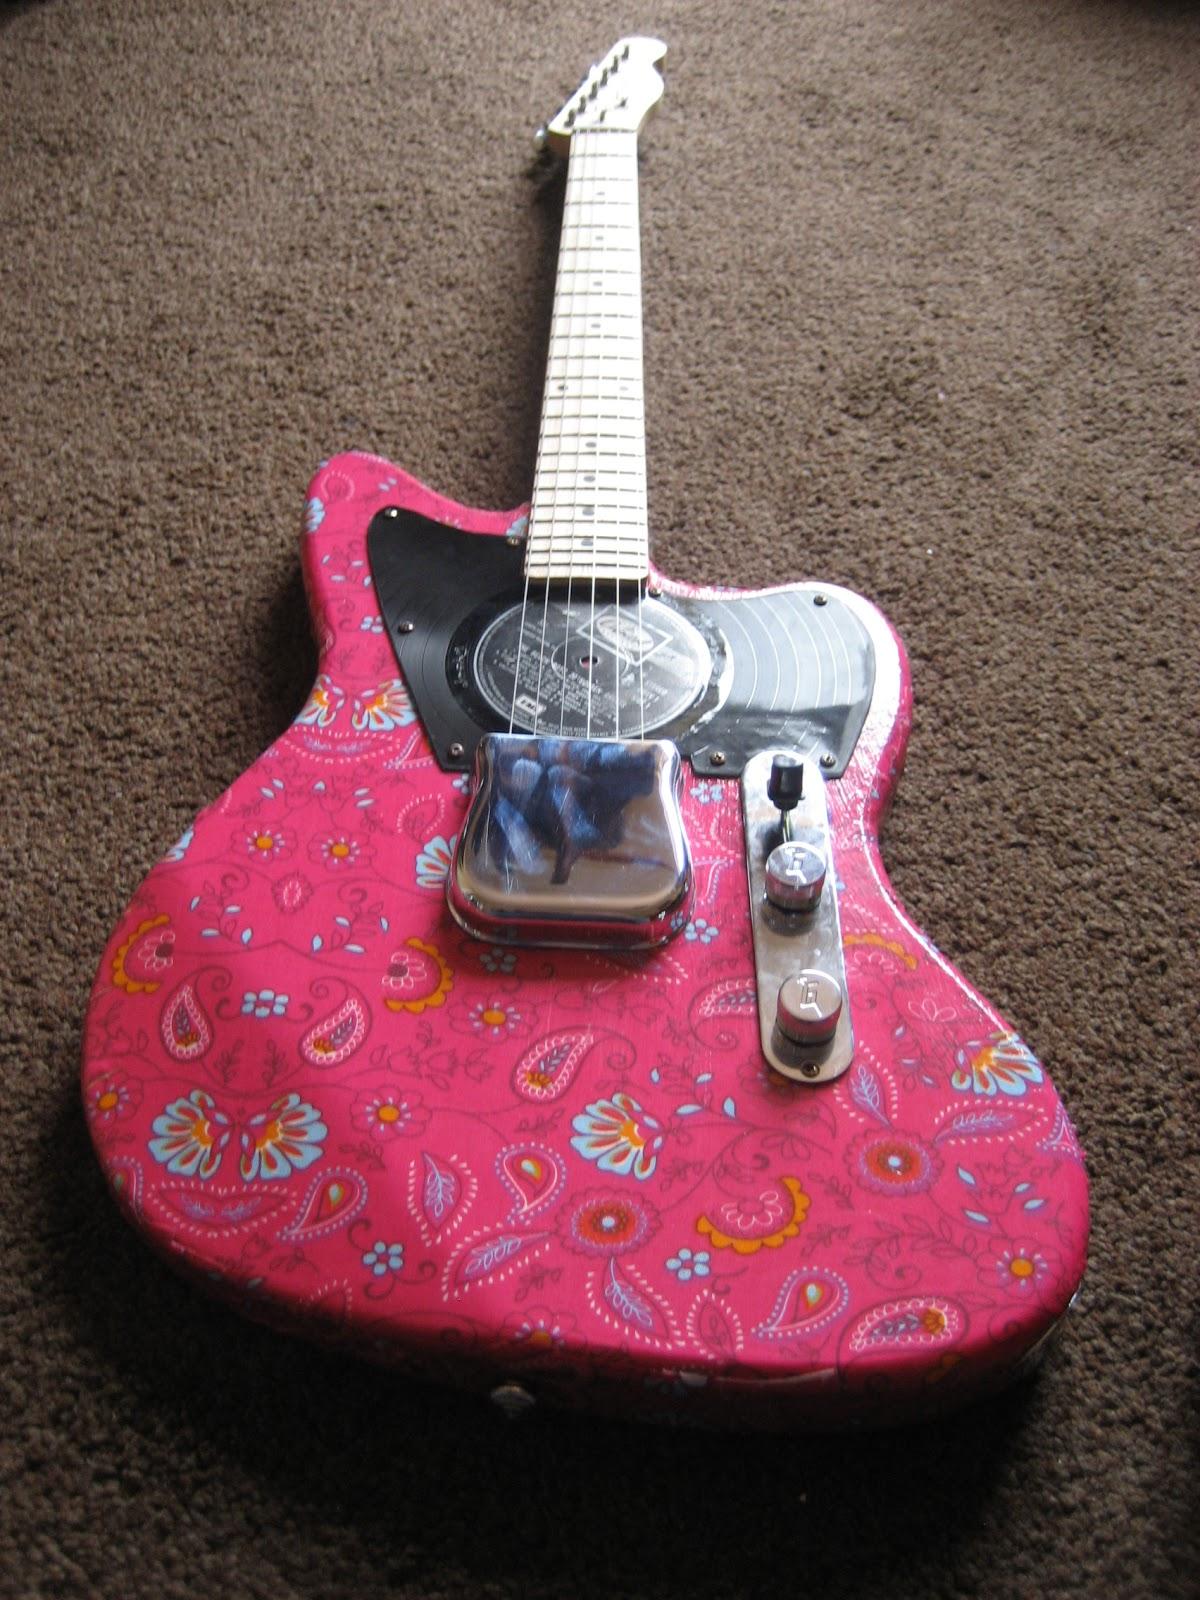 The Jooky Guitar Emporium: Sold: The JoBo One